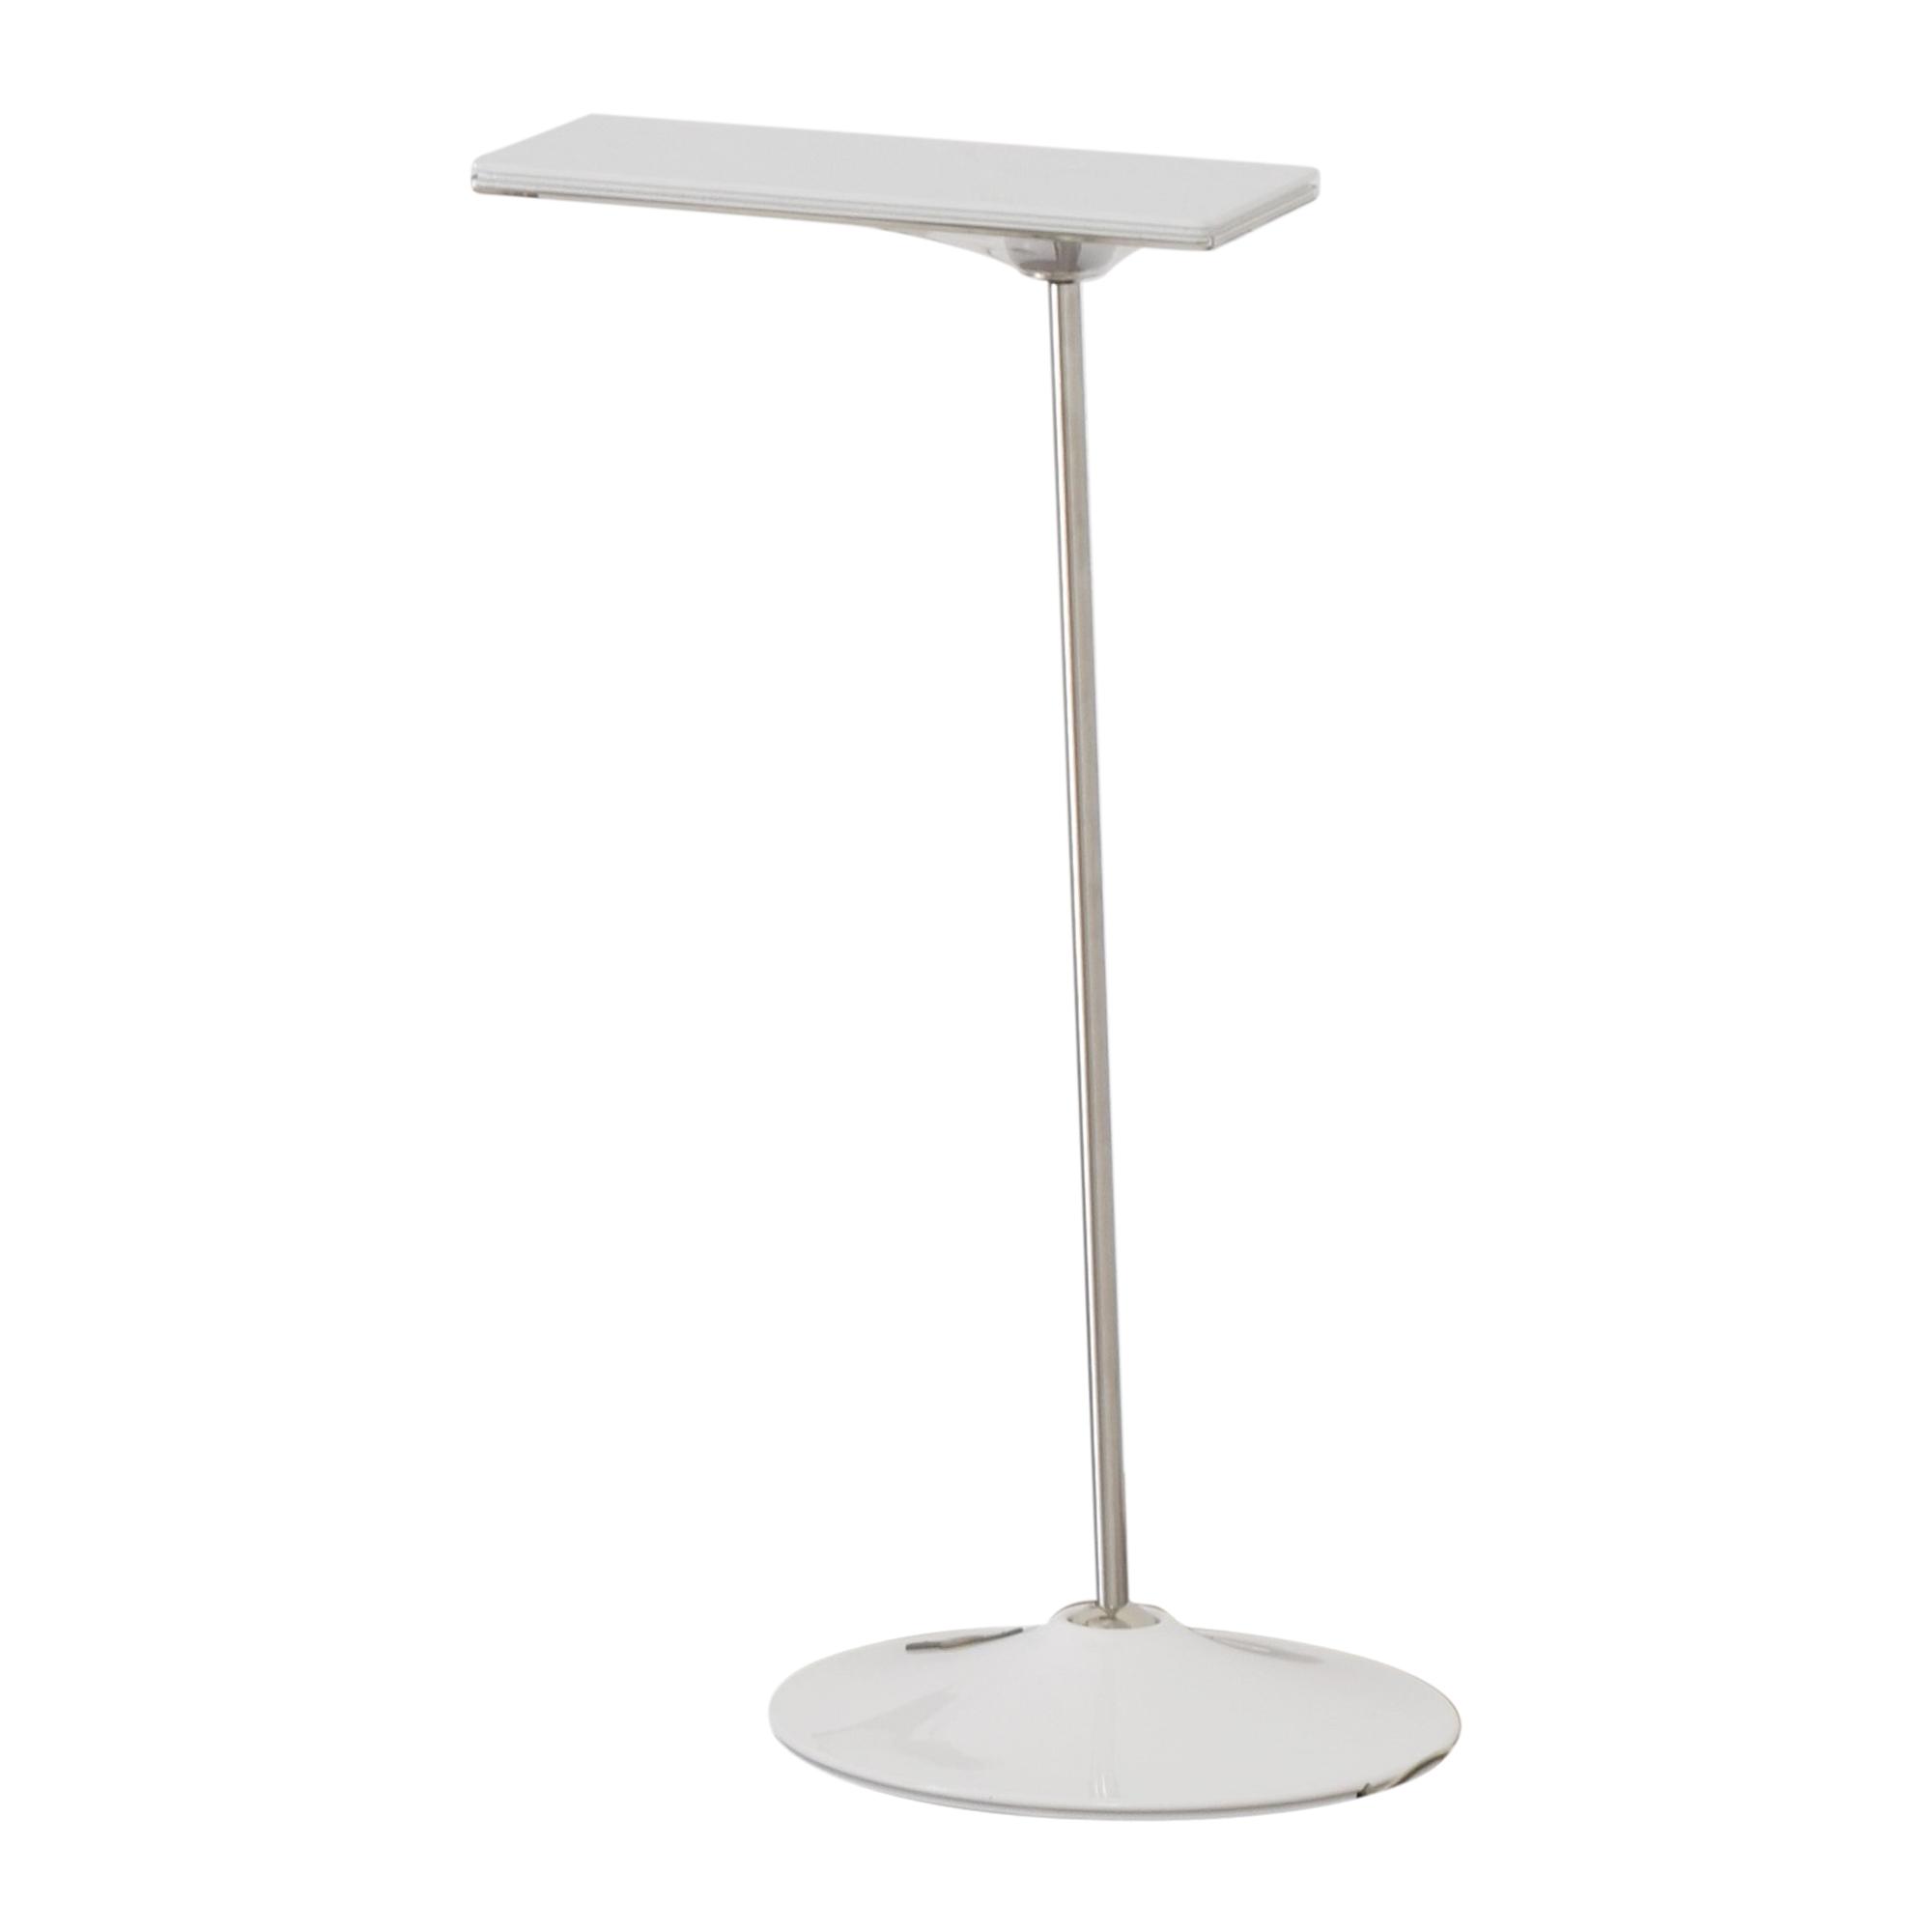 Room & Board Room & Board Horizon LED Table Lamp nyc